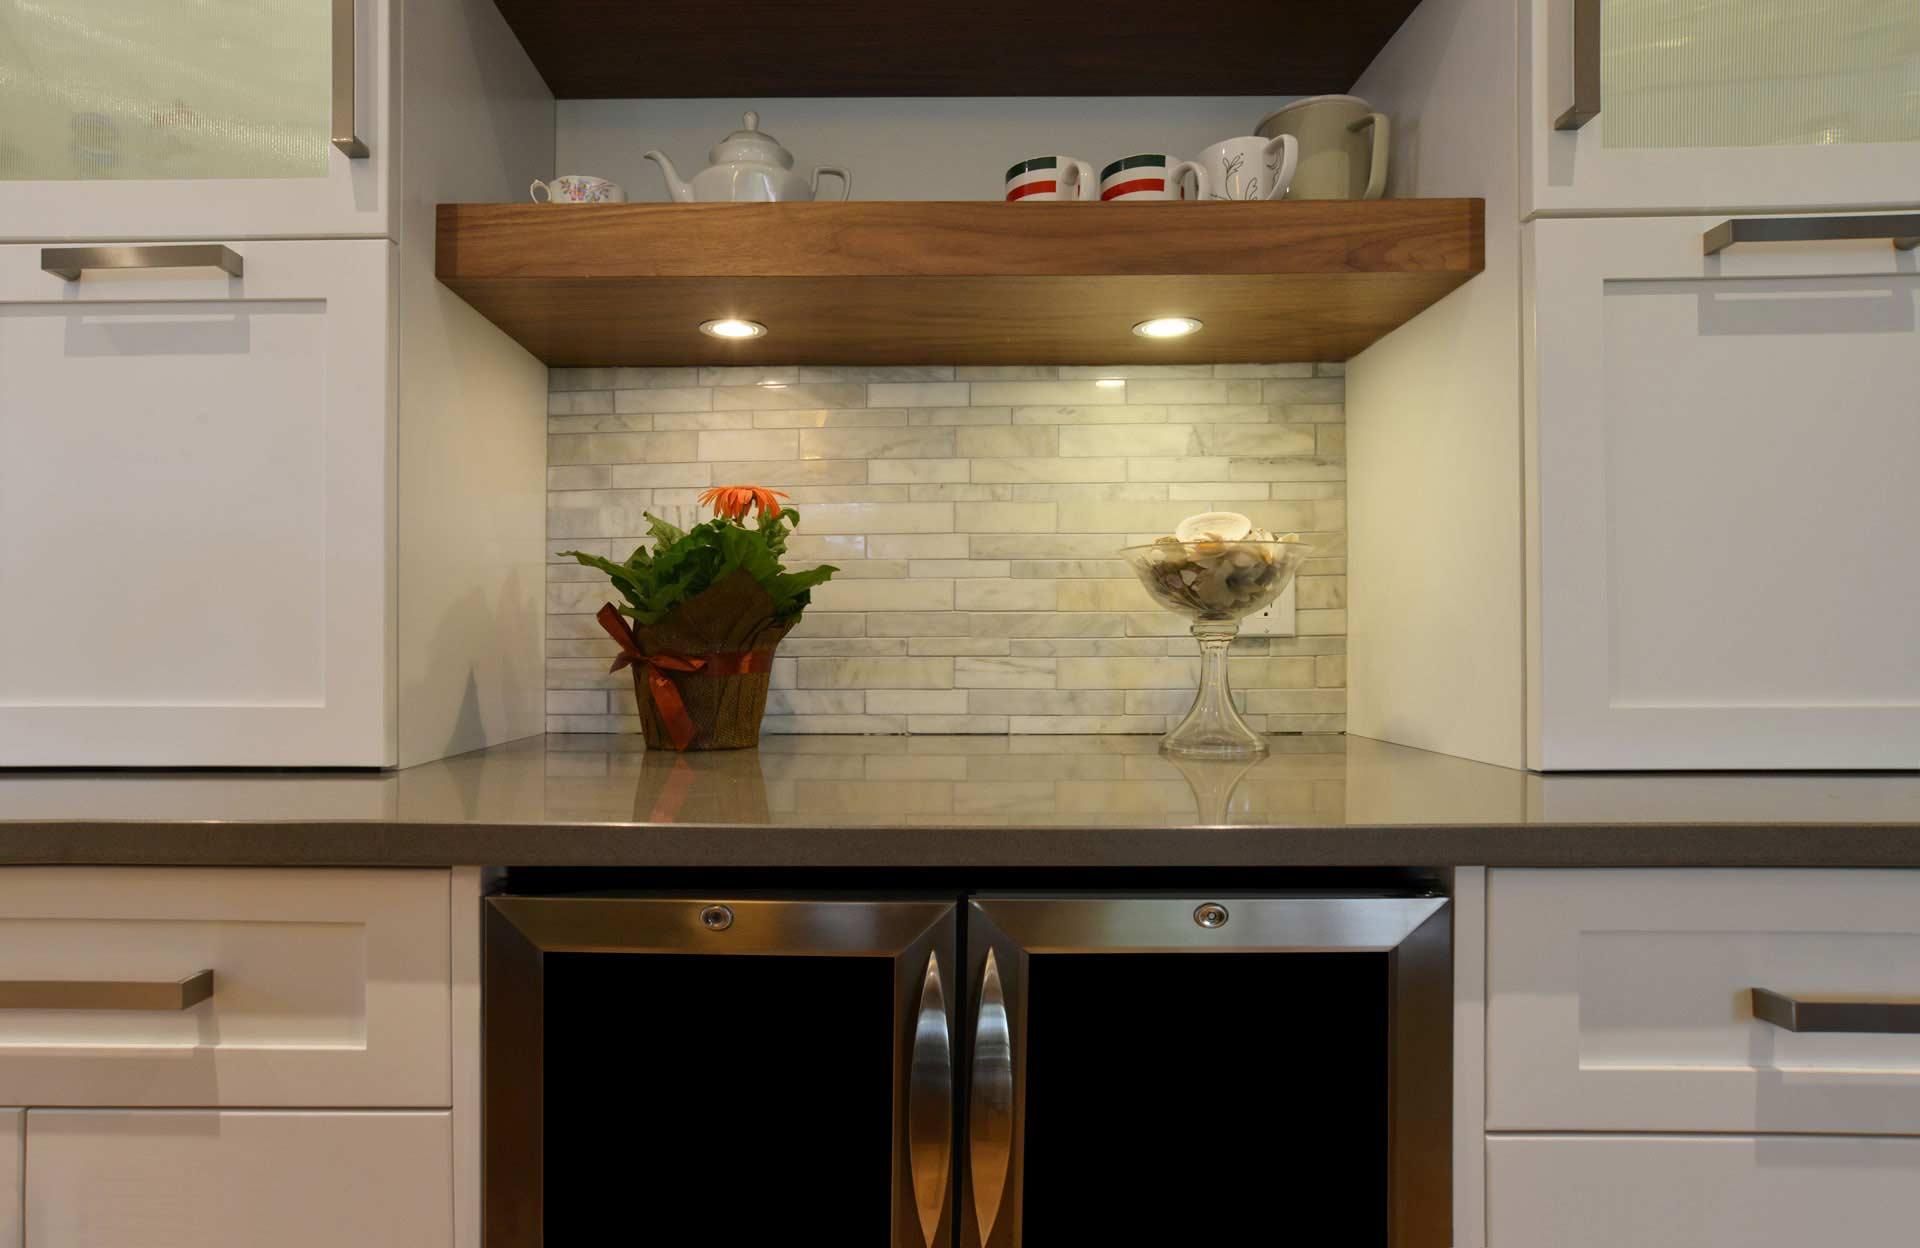 Kitchen Renovations In Kitchener And Waterloo Way Mar Home Renovation Contractors Kitchener Waterloo Cambridge Guelph